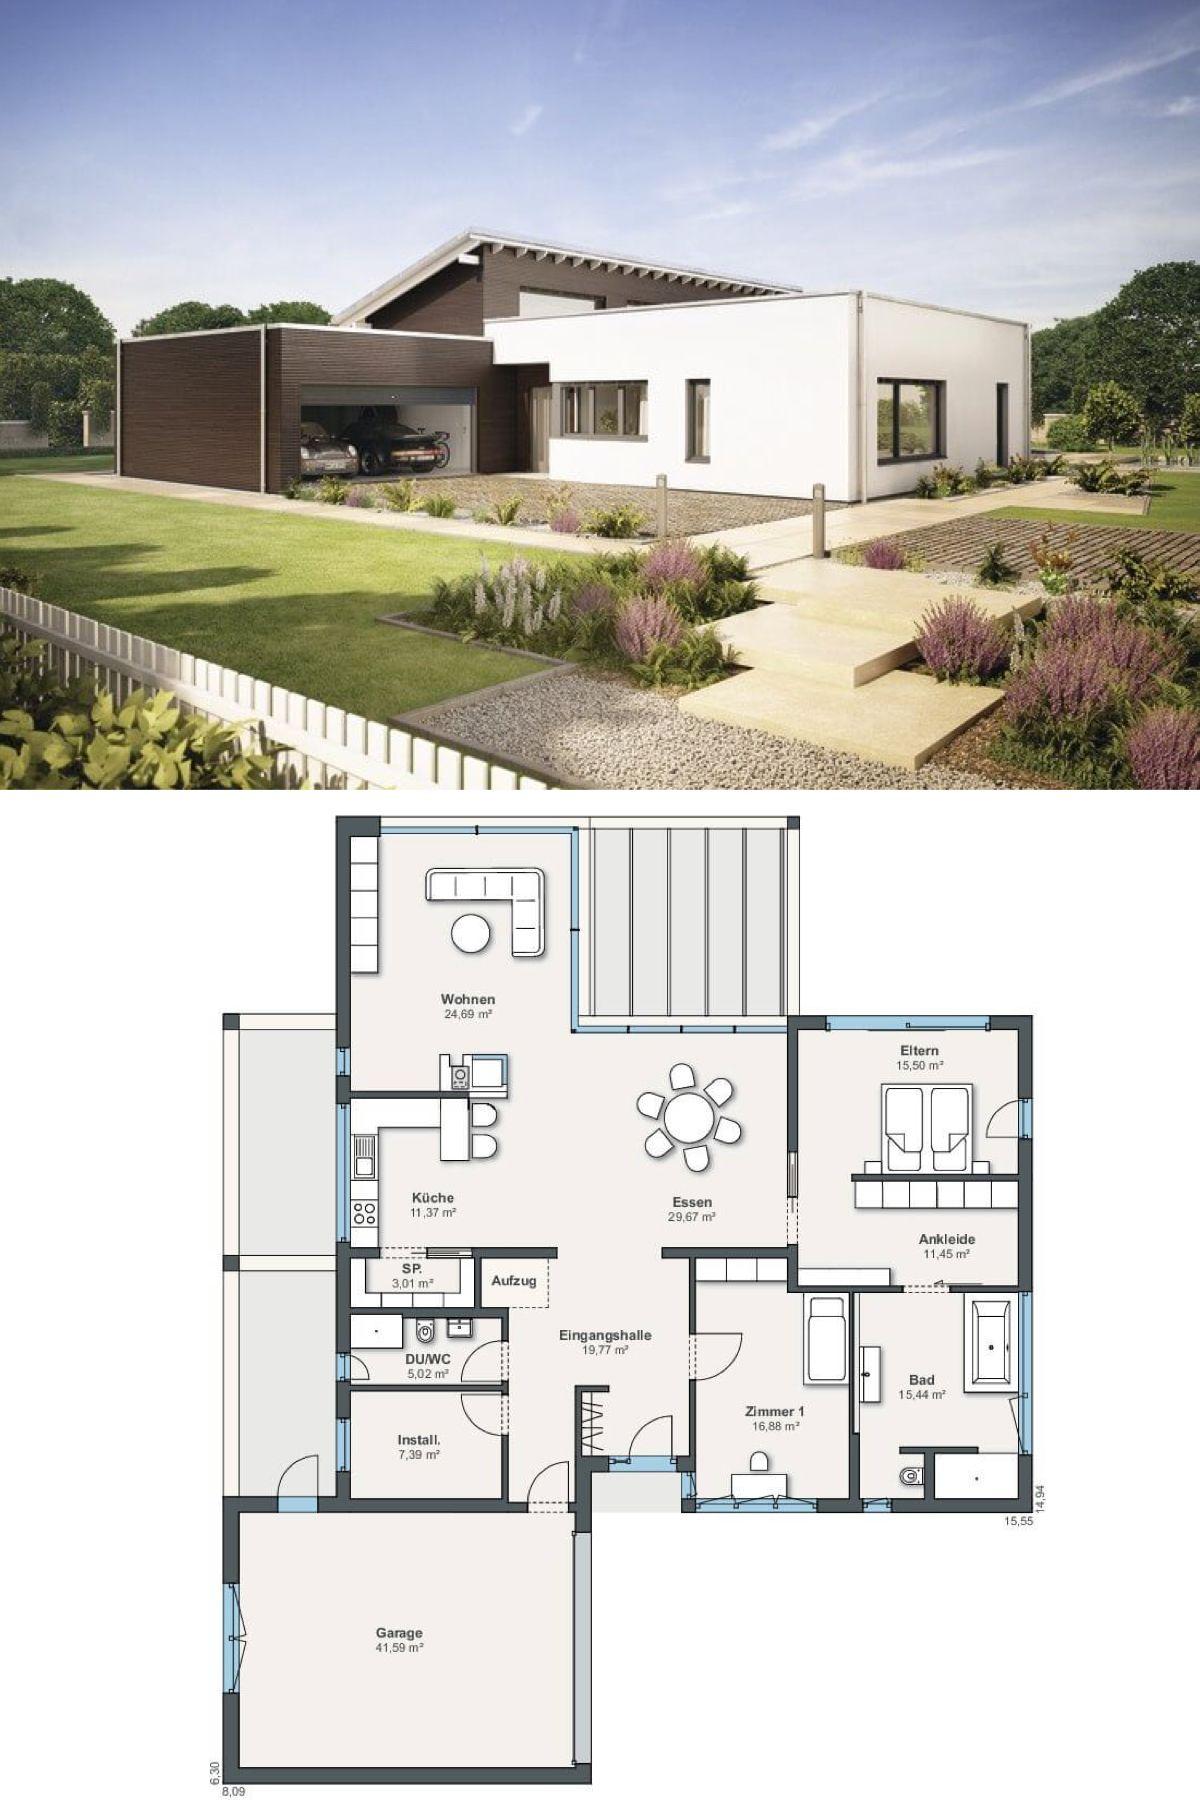 Bungalow Grundriss ebenleben Weberhaus Haus Ideen